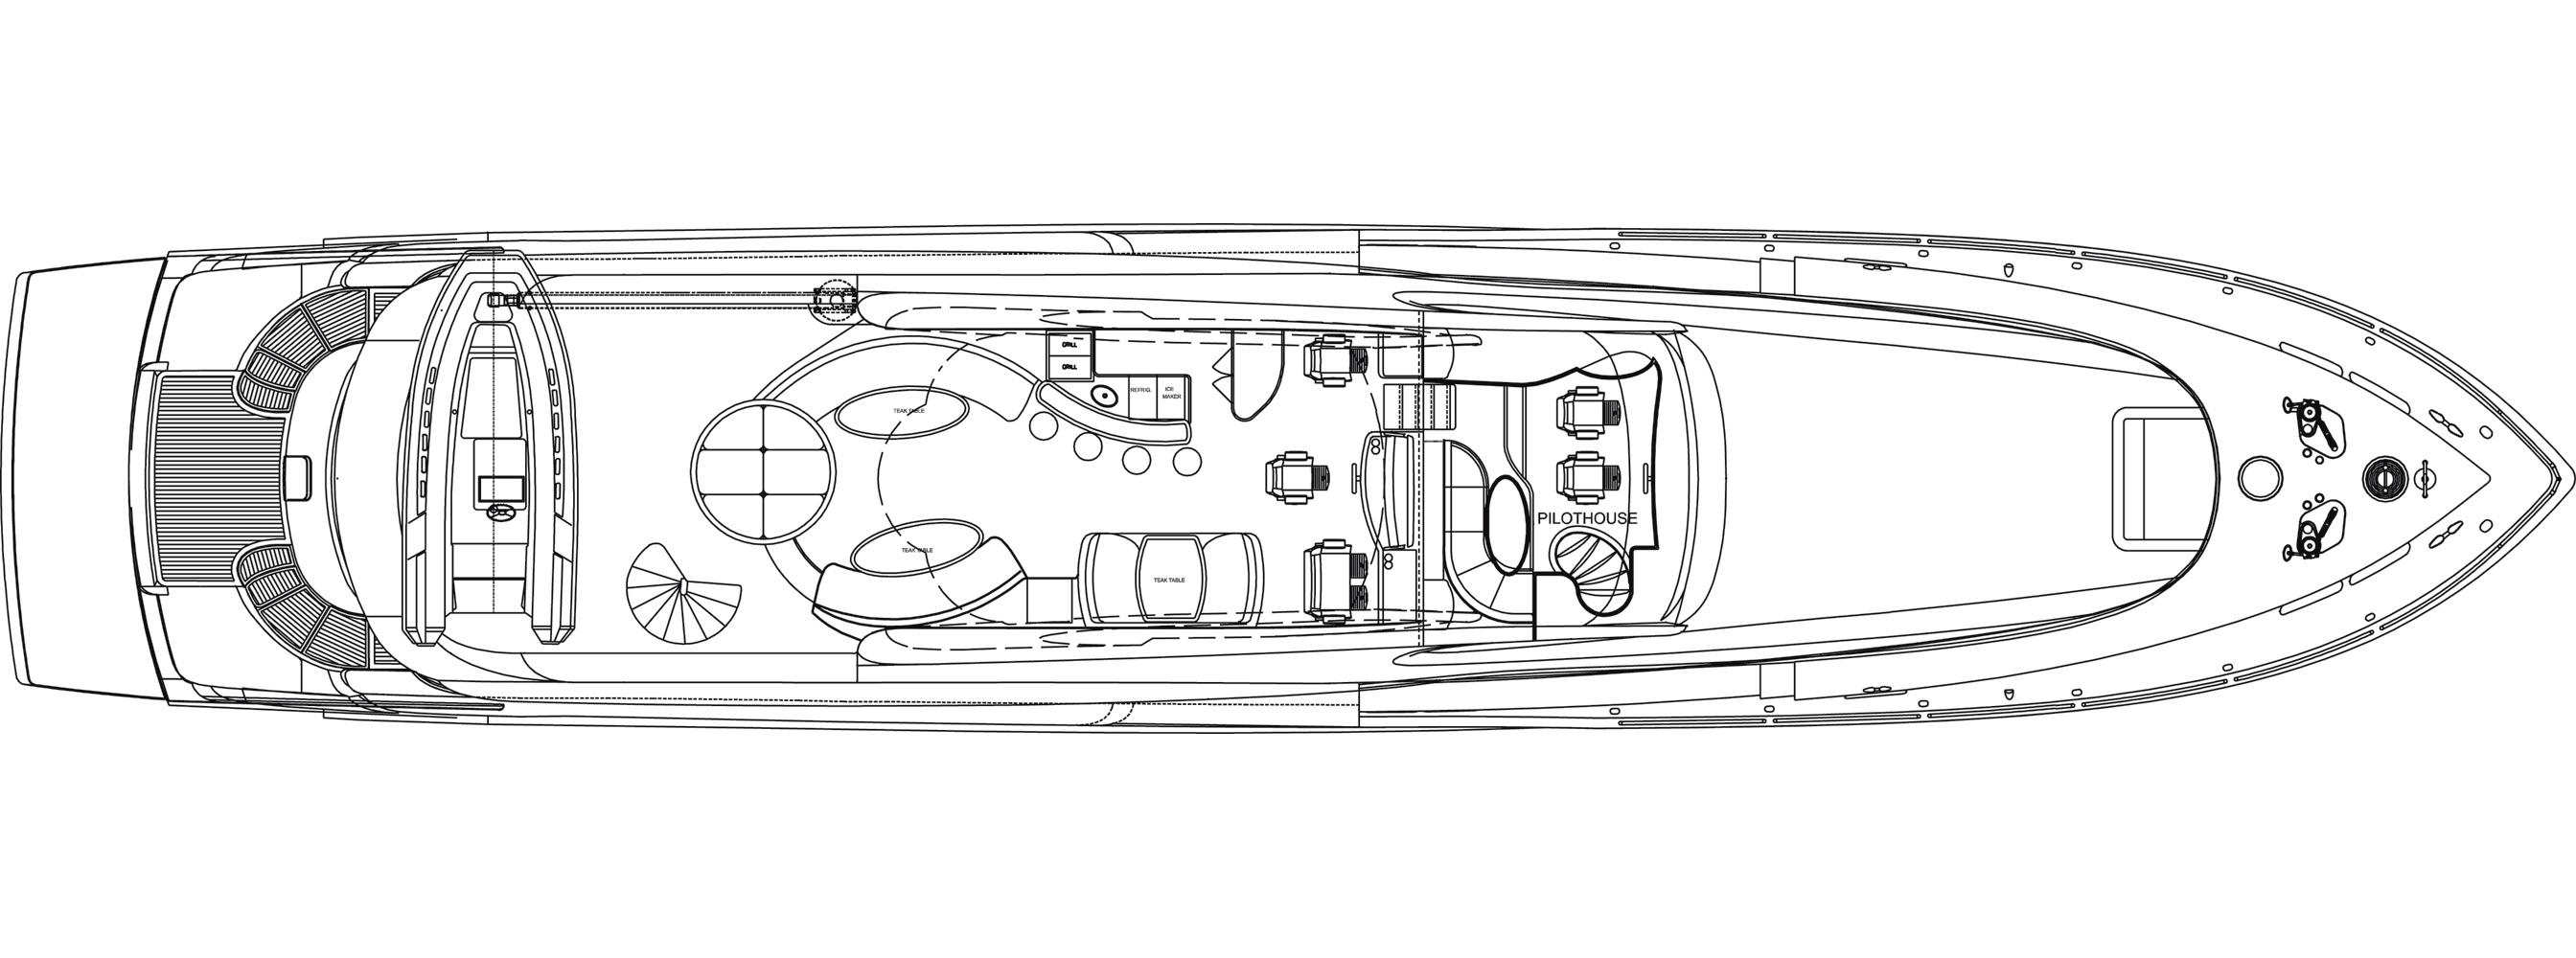 Motor yacht Don Carlo -  Top Deck Layout